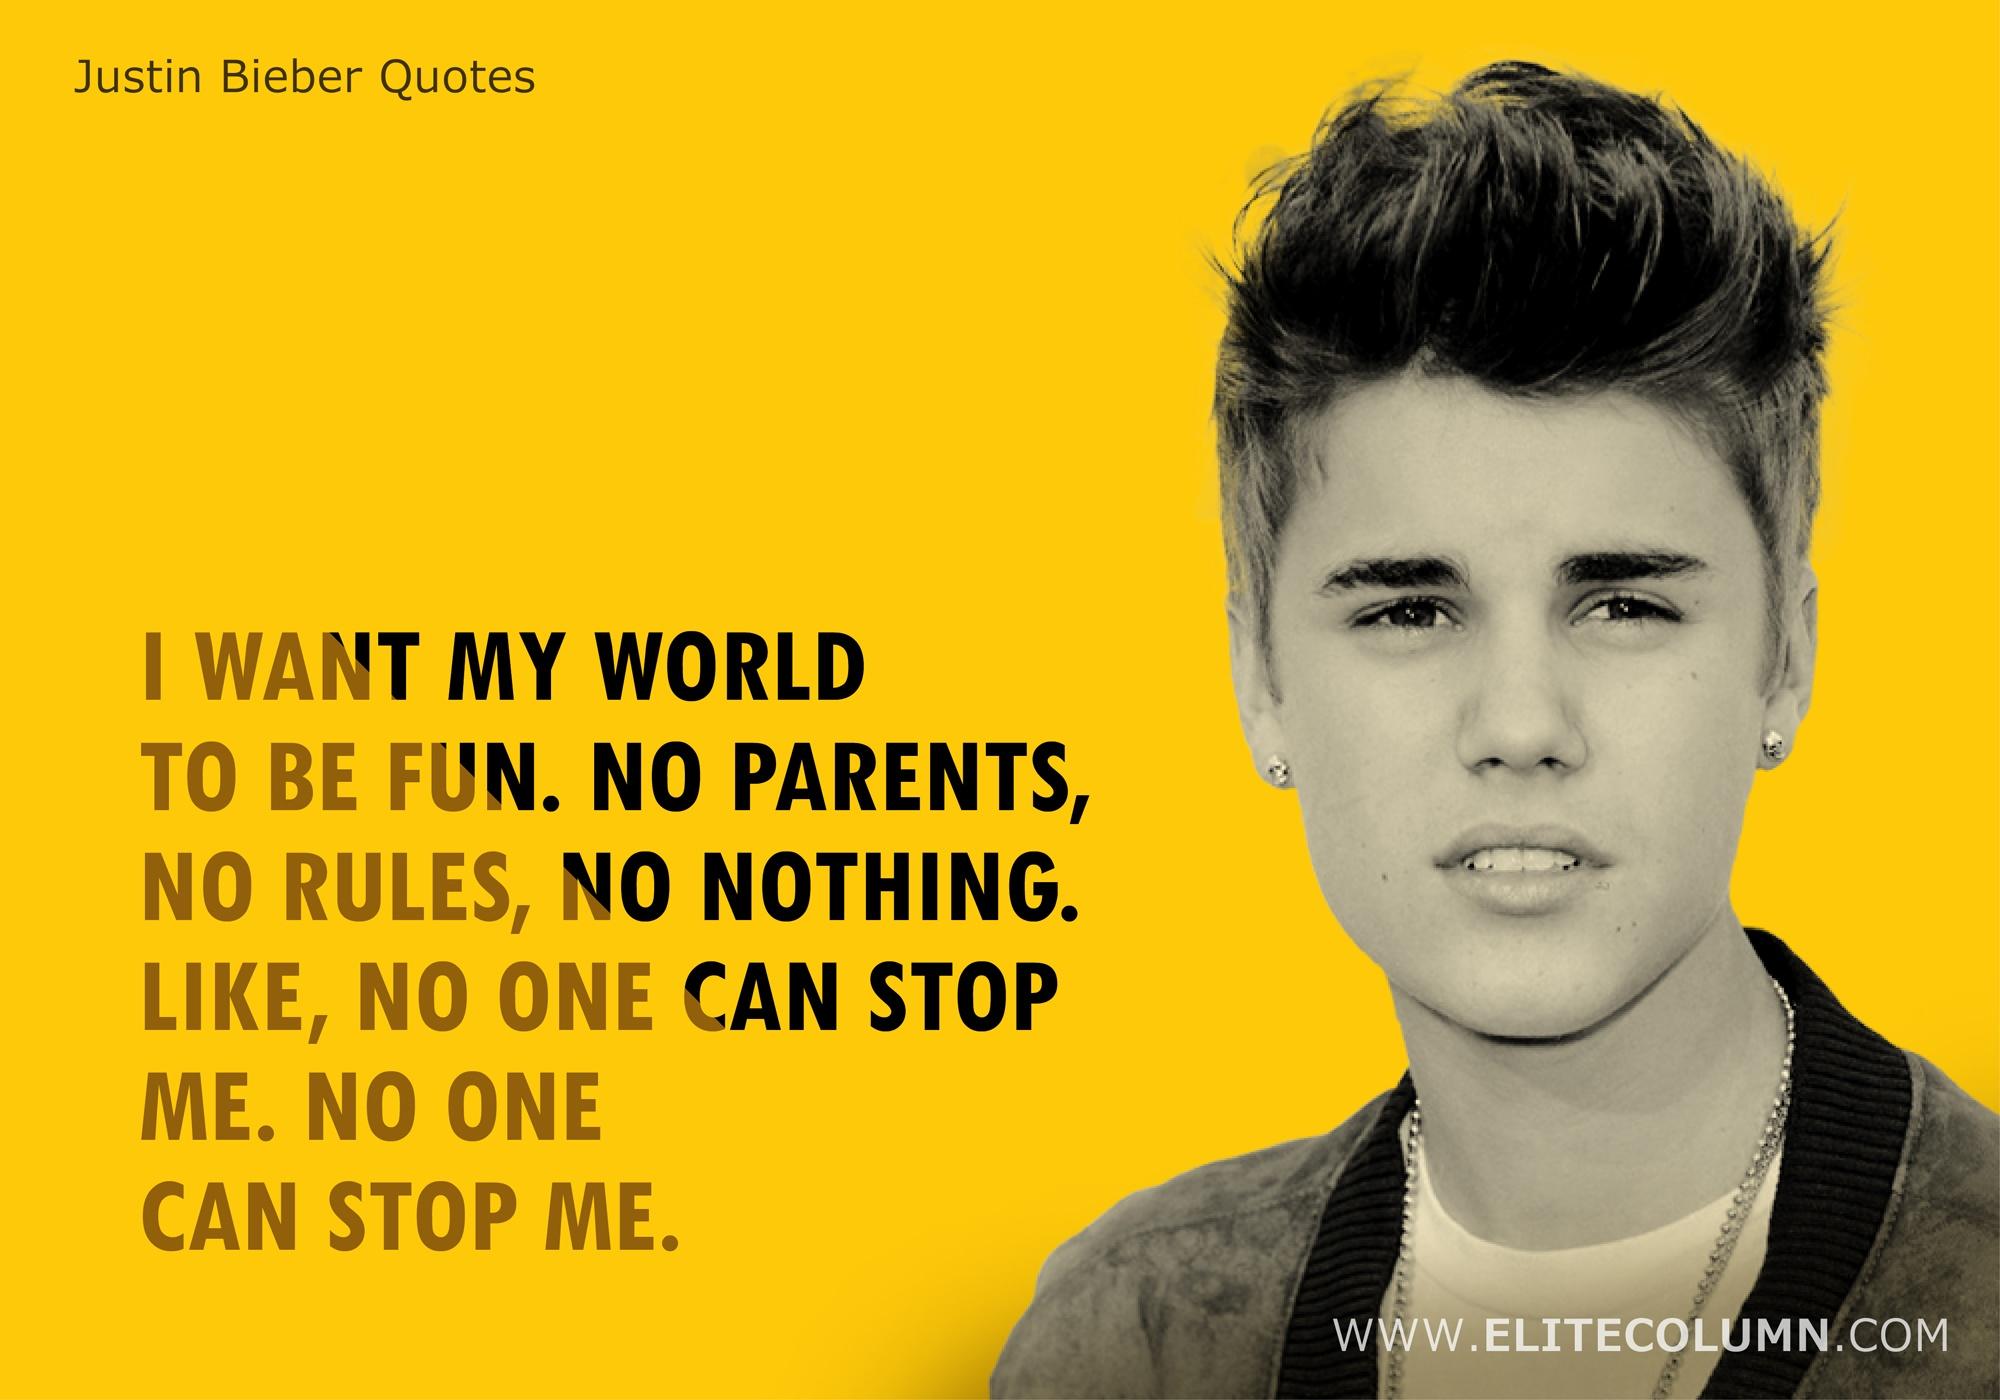 Justin Bieber Quotes (4)